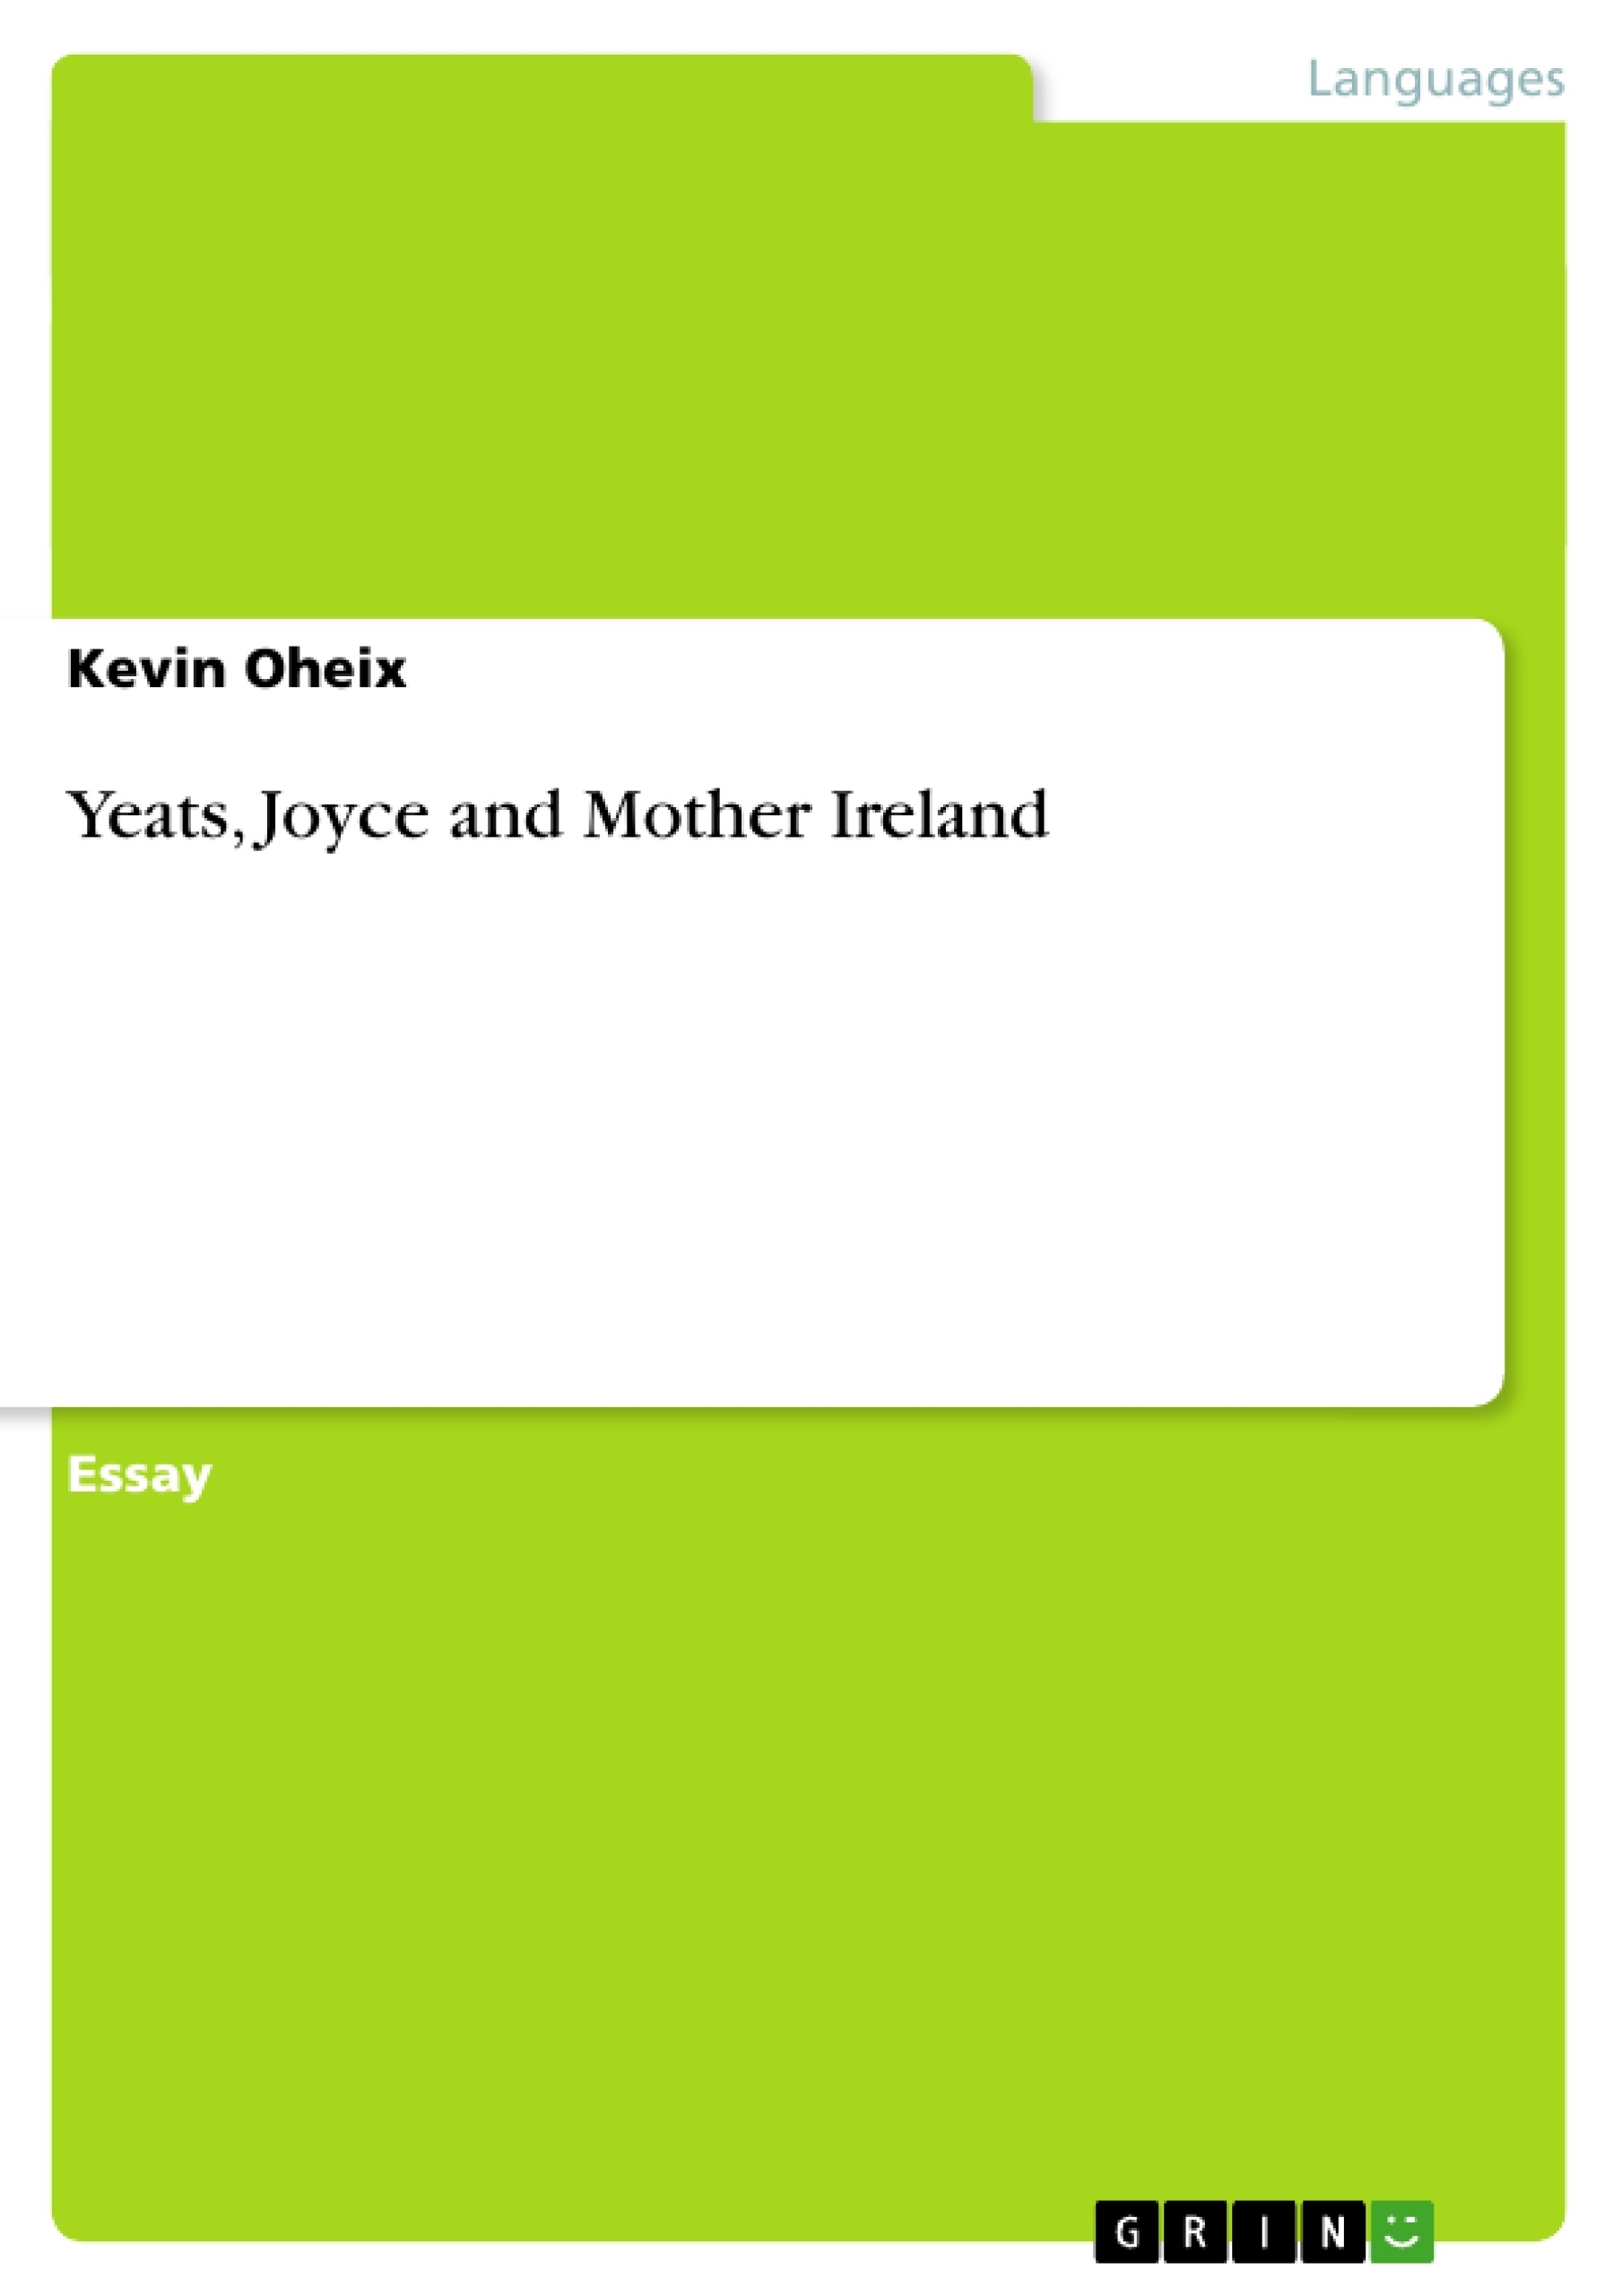 Title: Yeats, Joyce and Mother Ireland